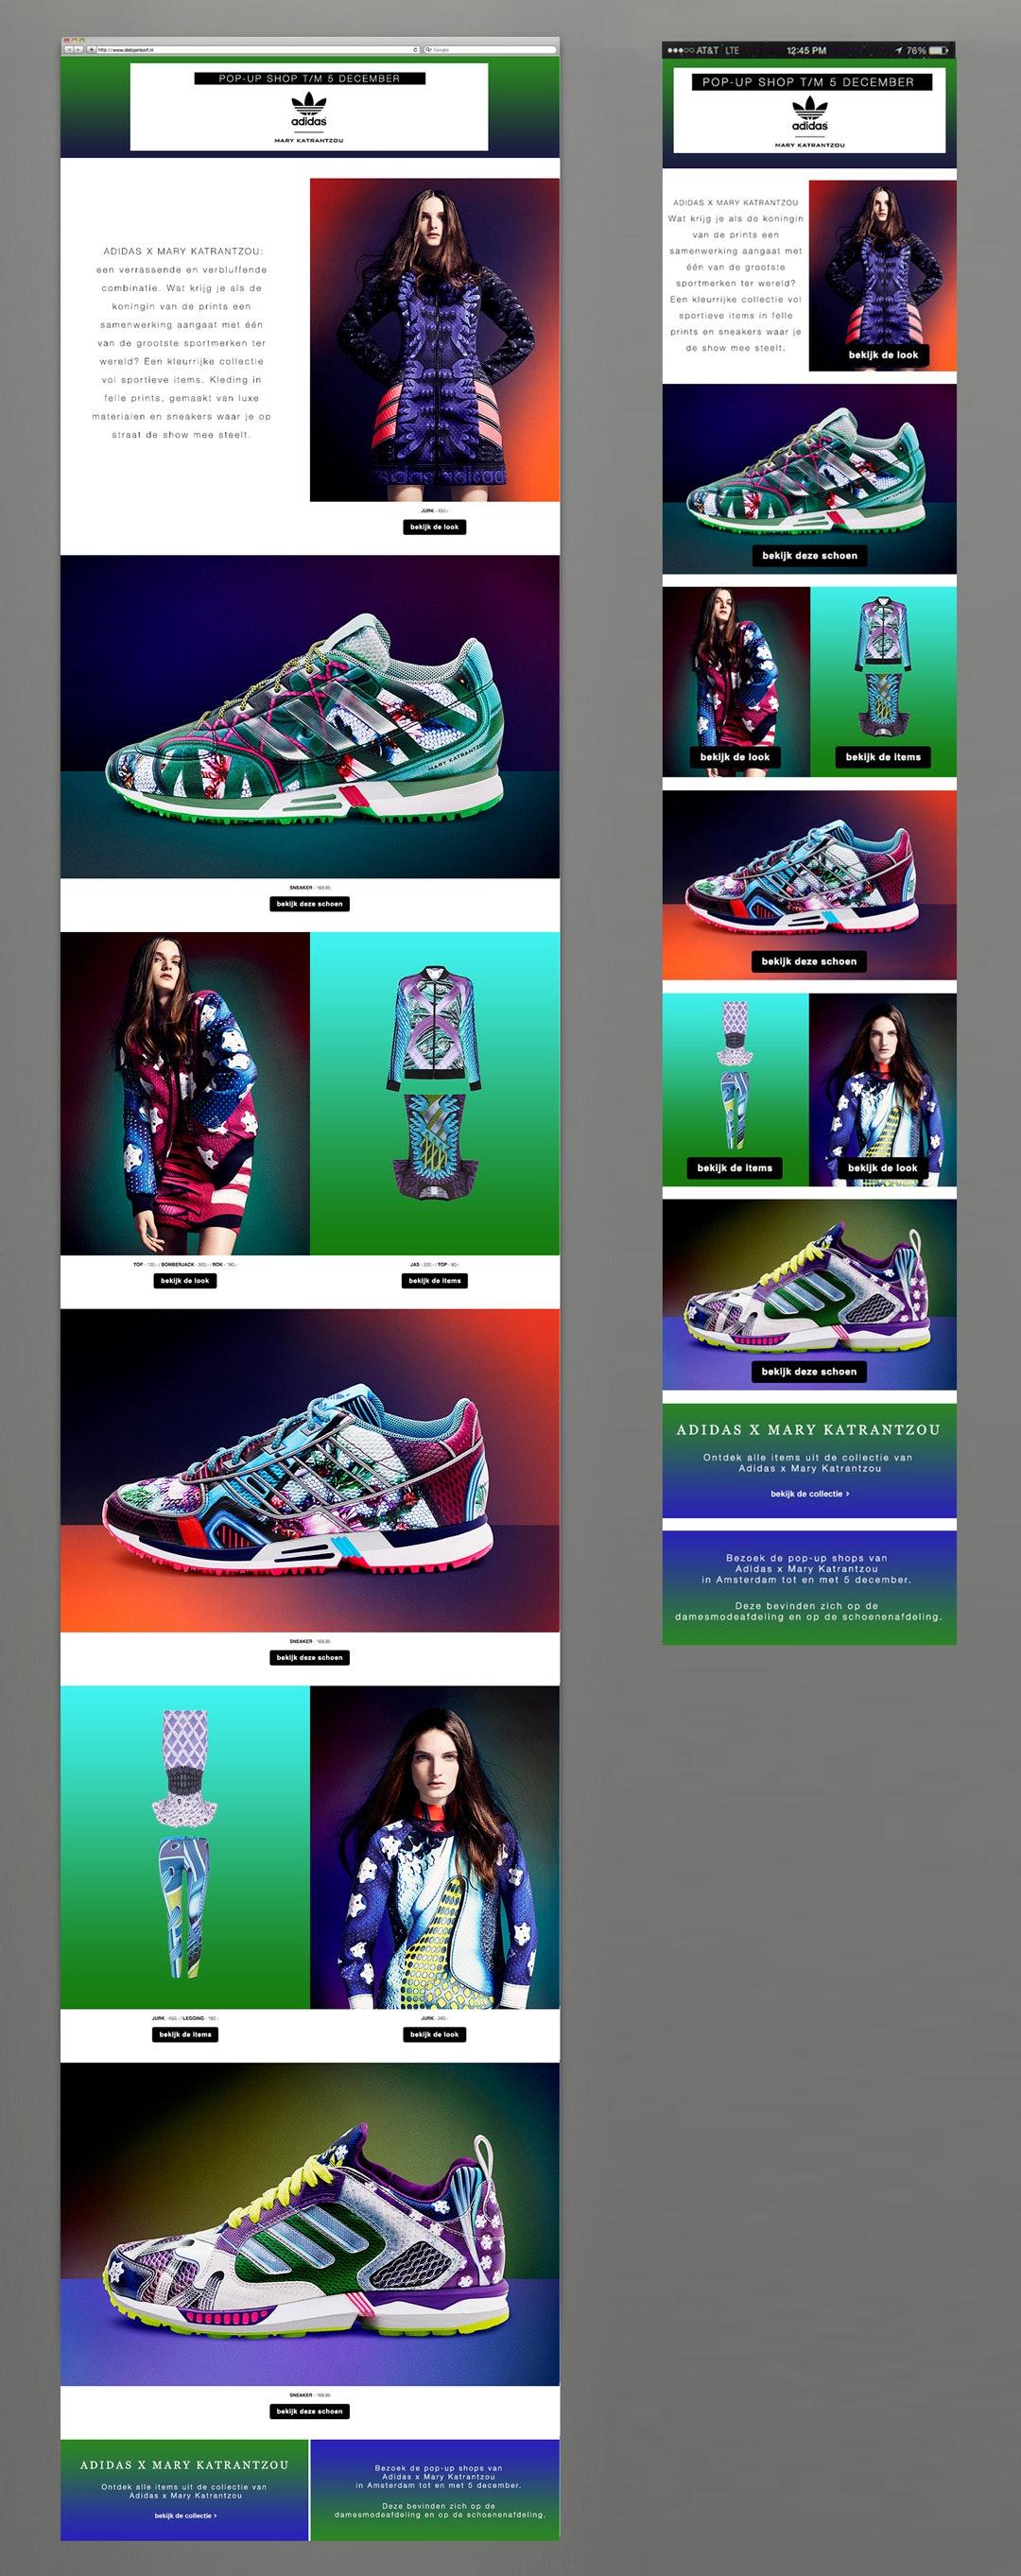 DeBijenkorf_Adidas_Mary_Katrantzou_Sophie_Gerritsen